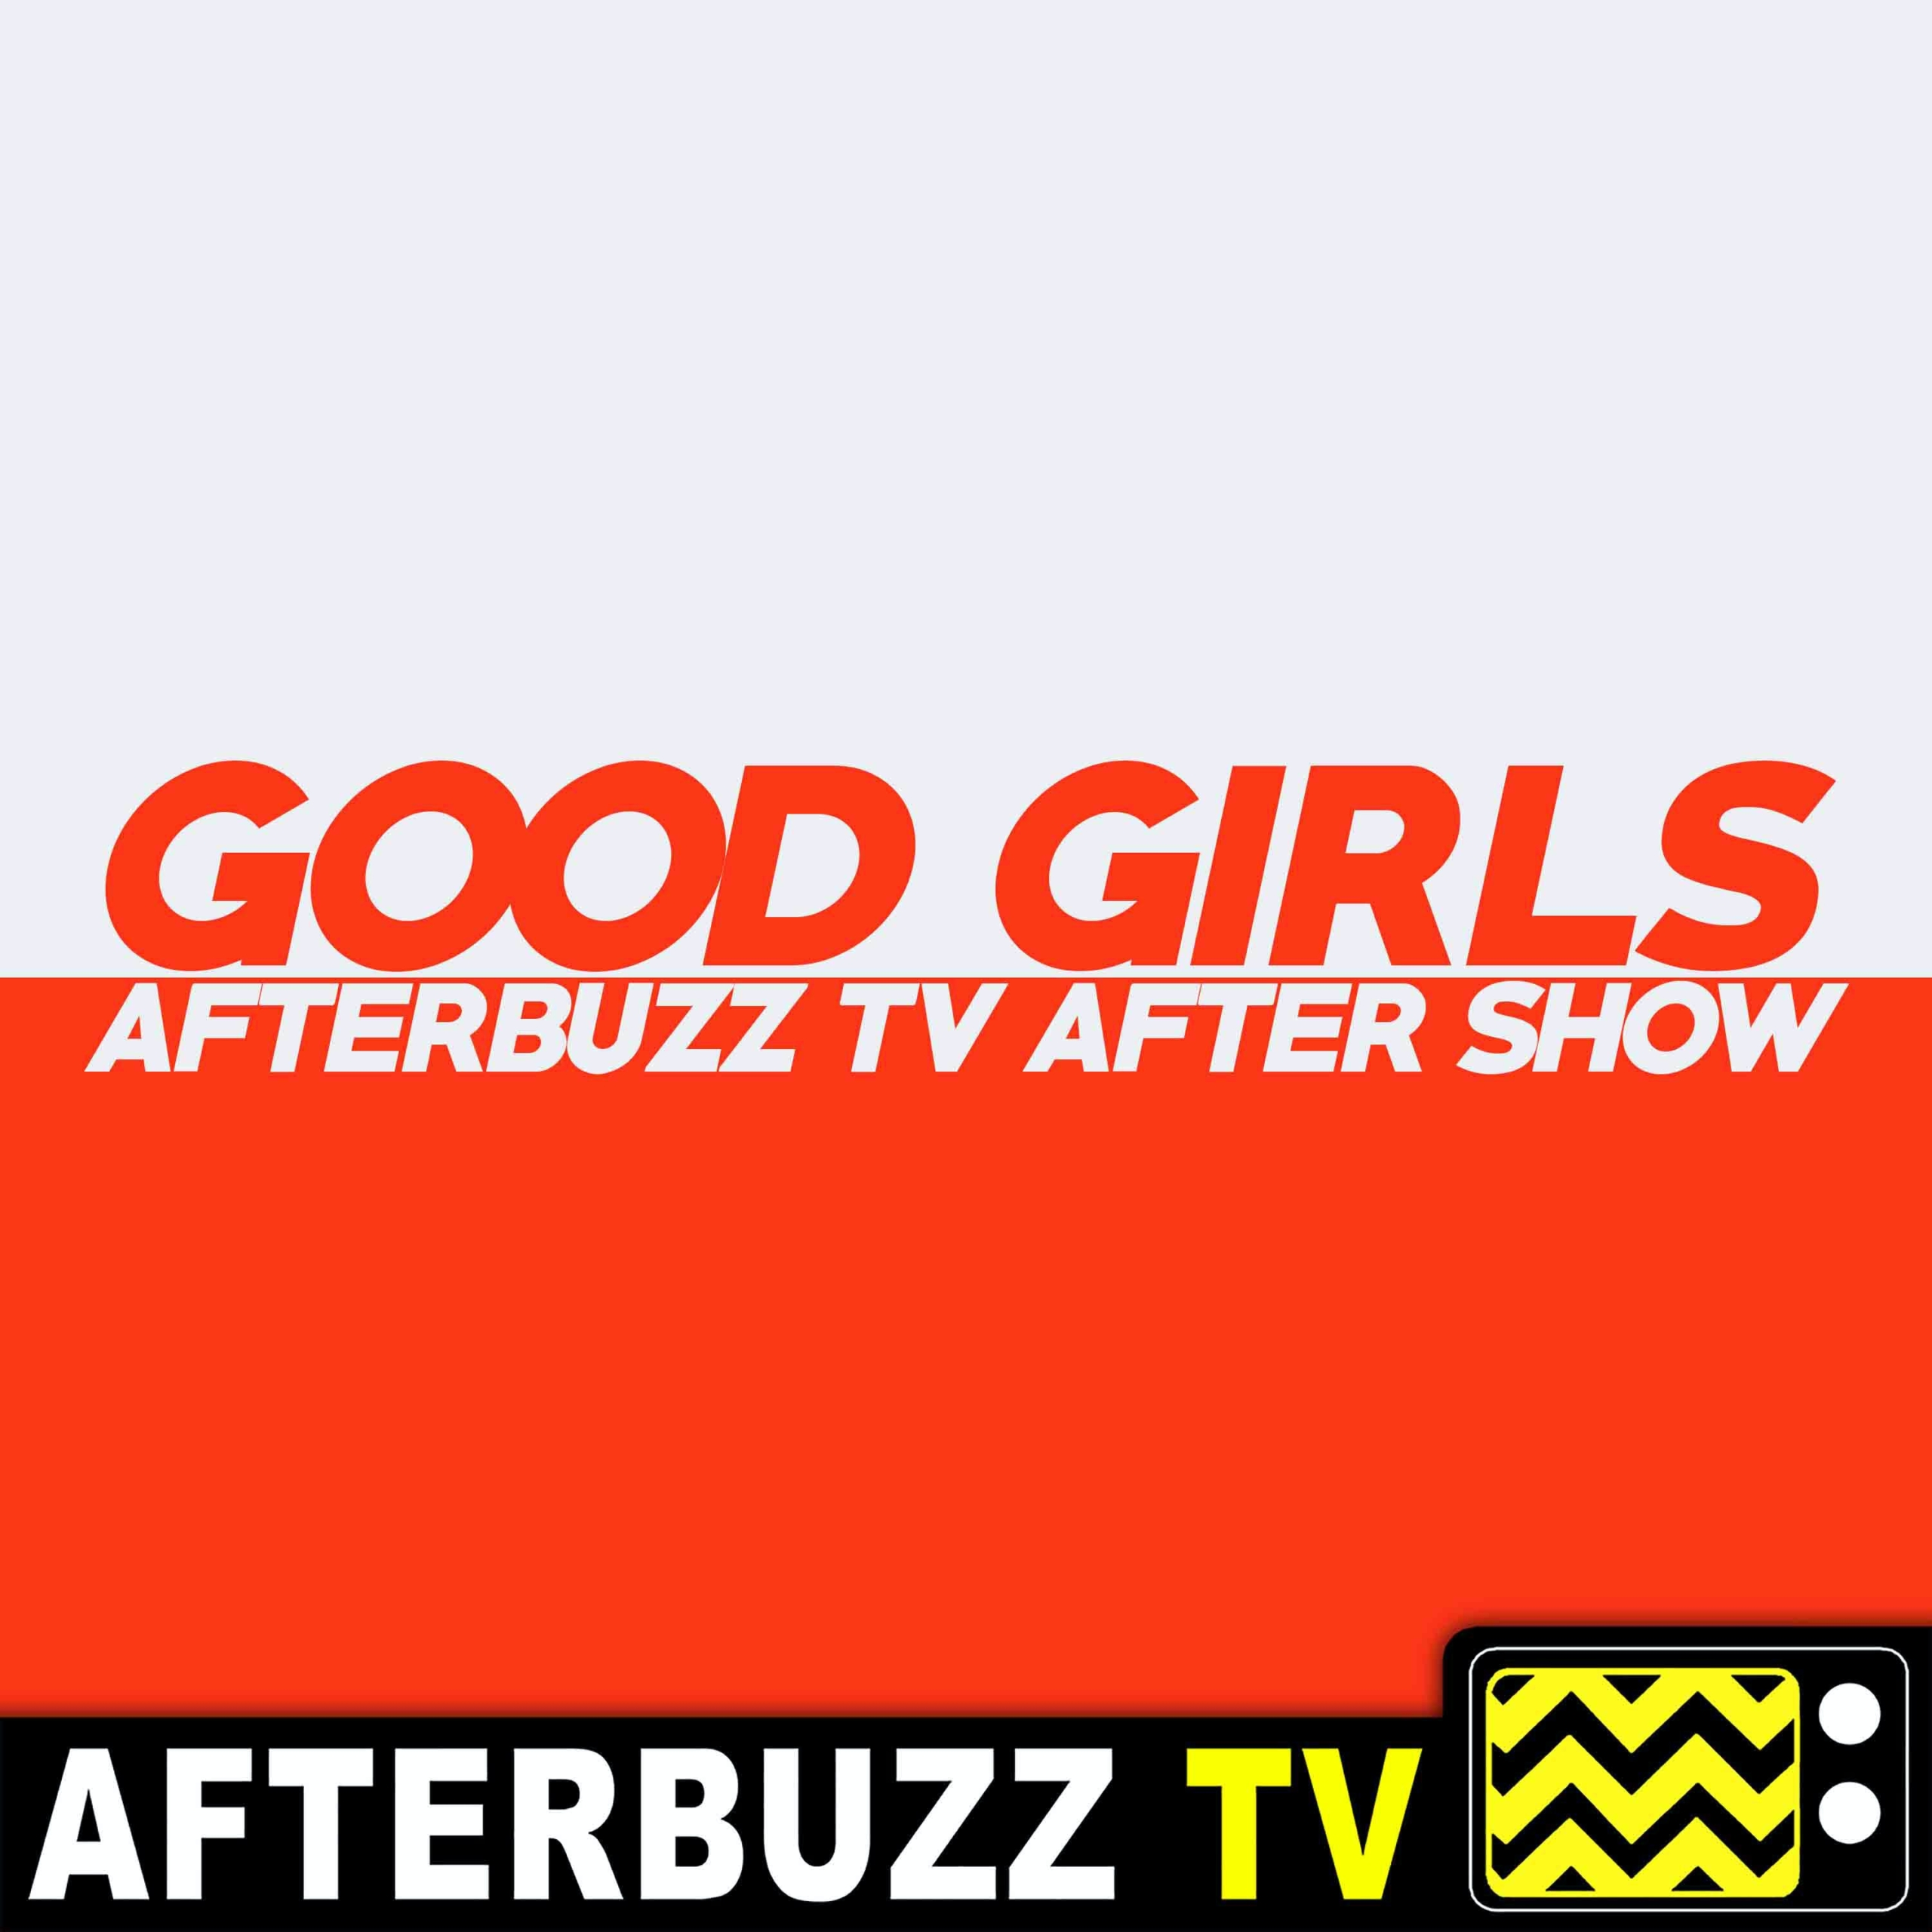 The Good Girls Podcast